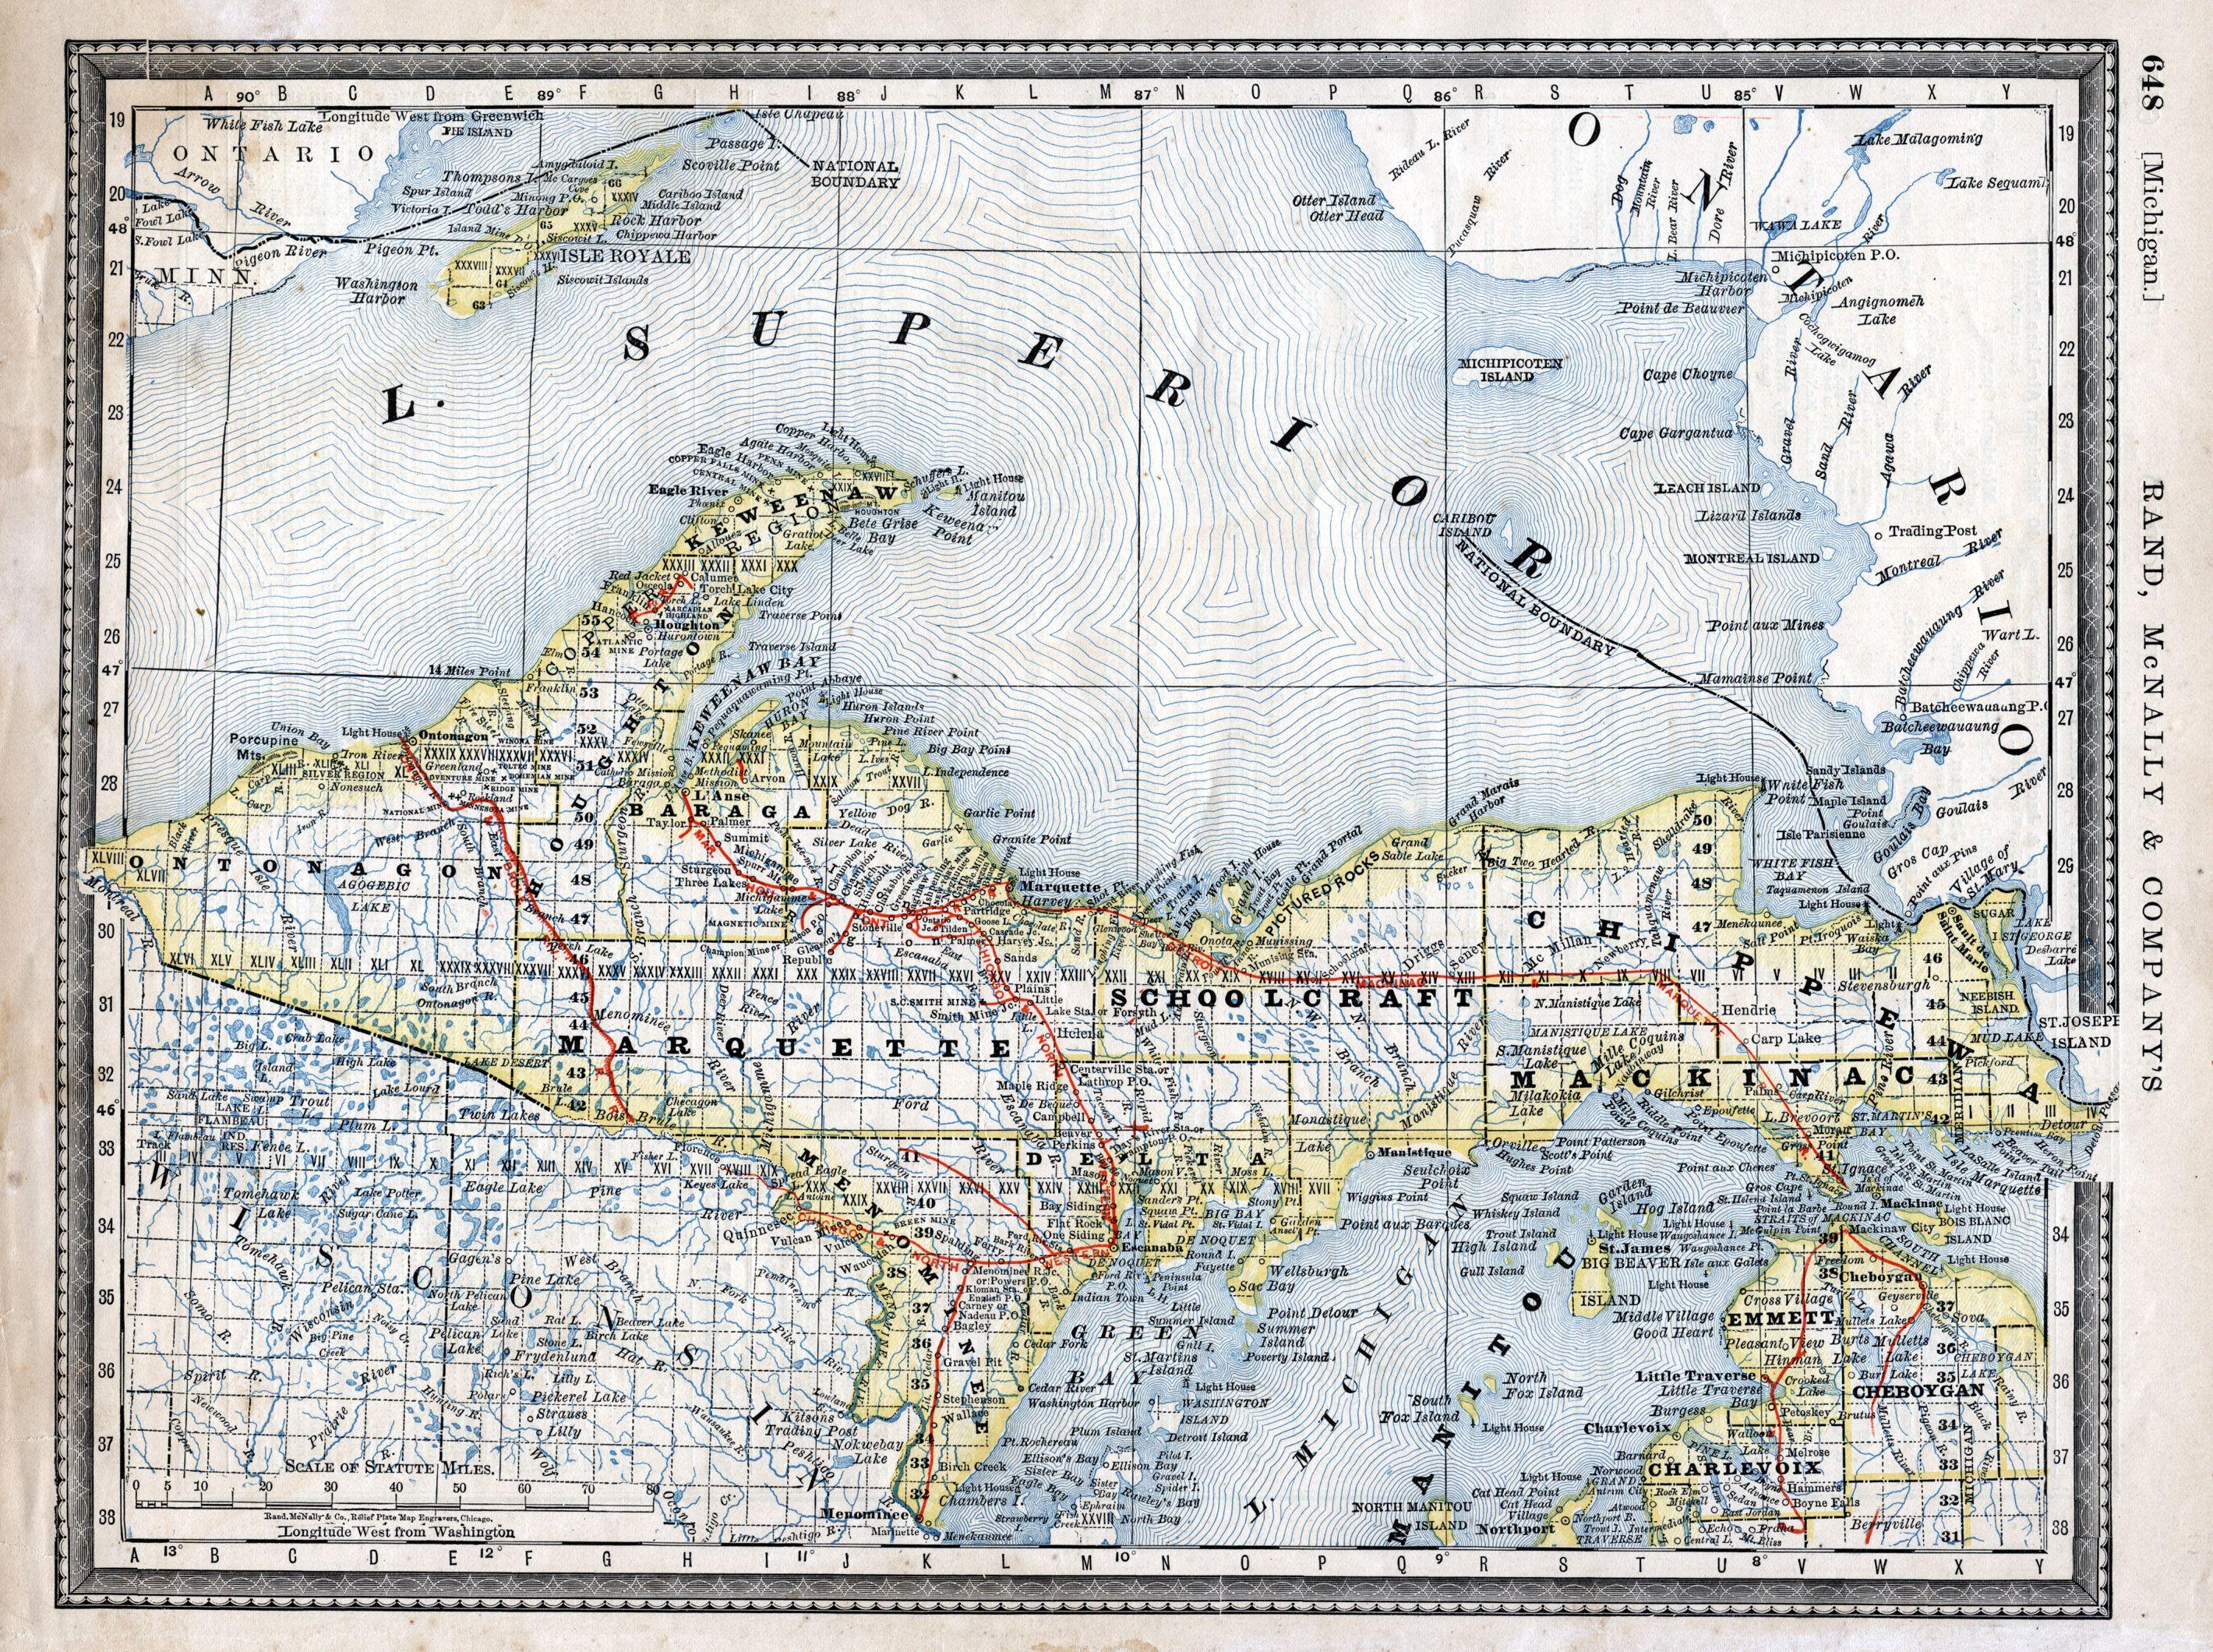 upper michigan map google Google Image Result For Http Img Lib Msu Edu Exhibits Map